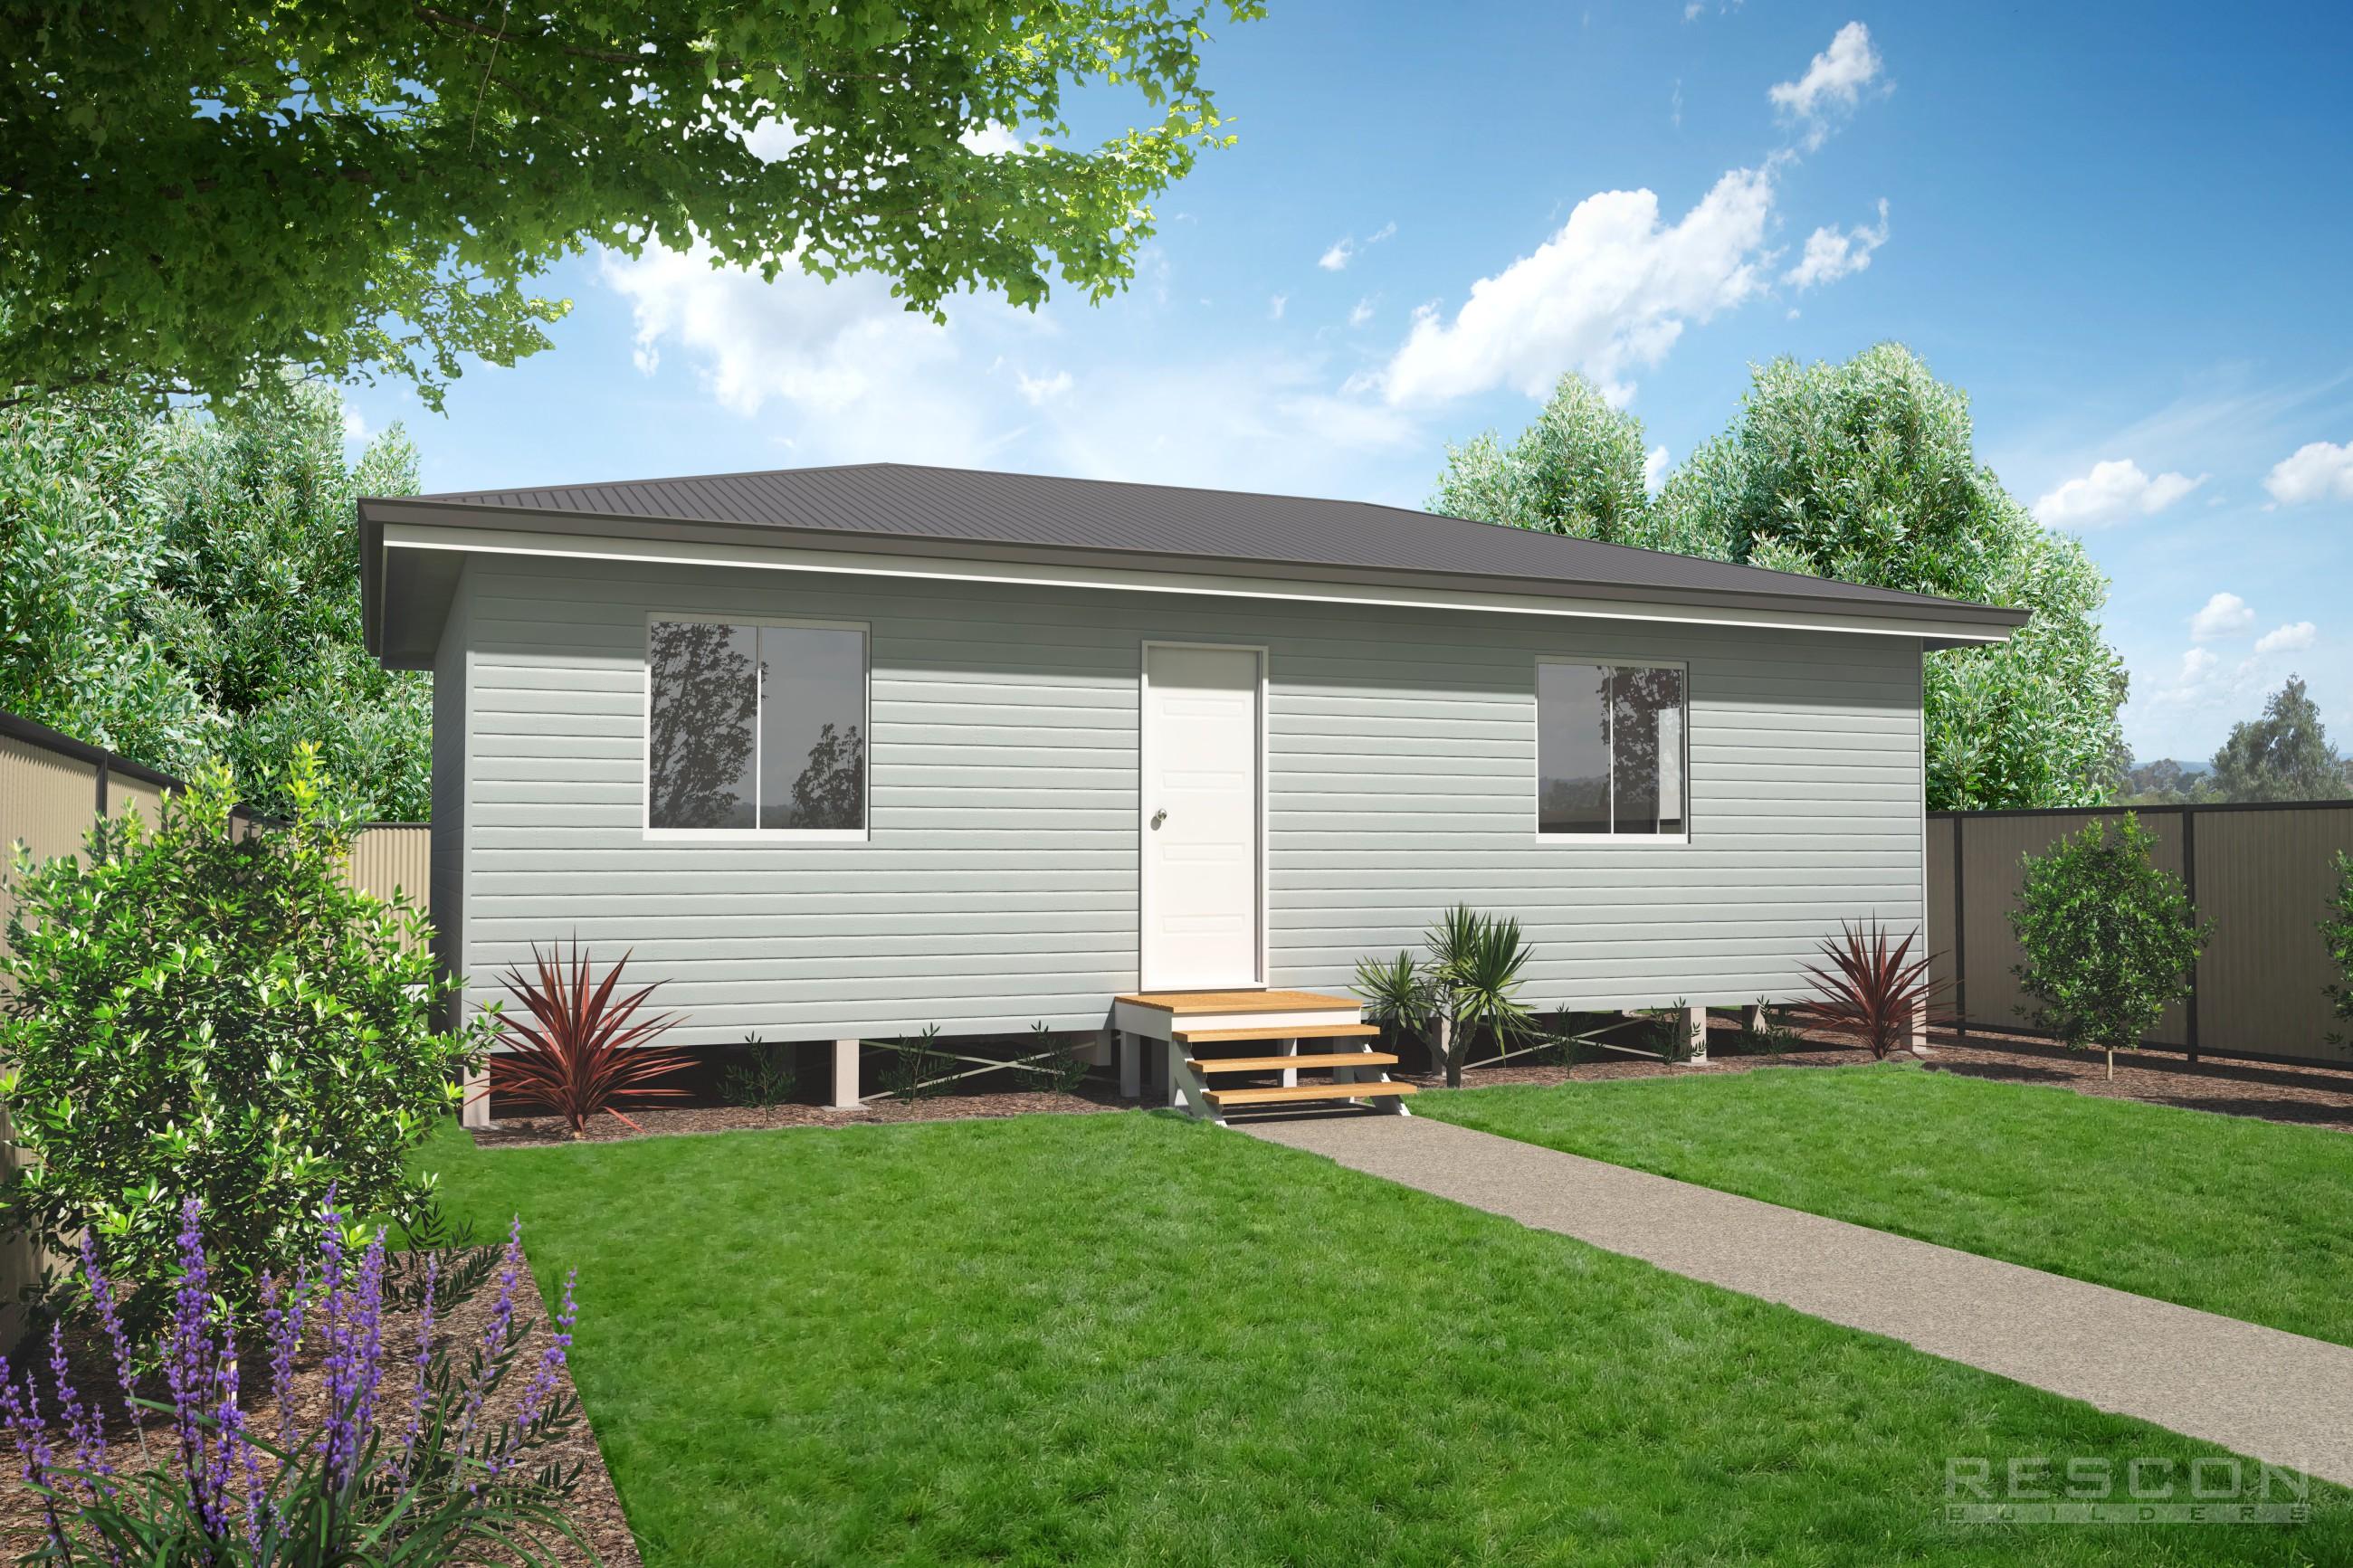 Wilkinson rescon builders for Wilkinson homes